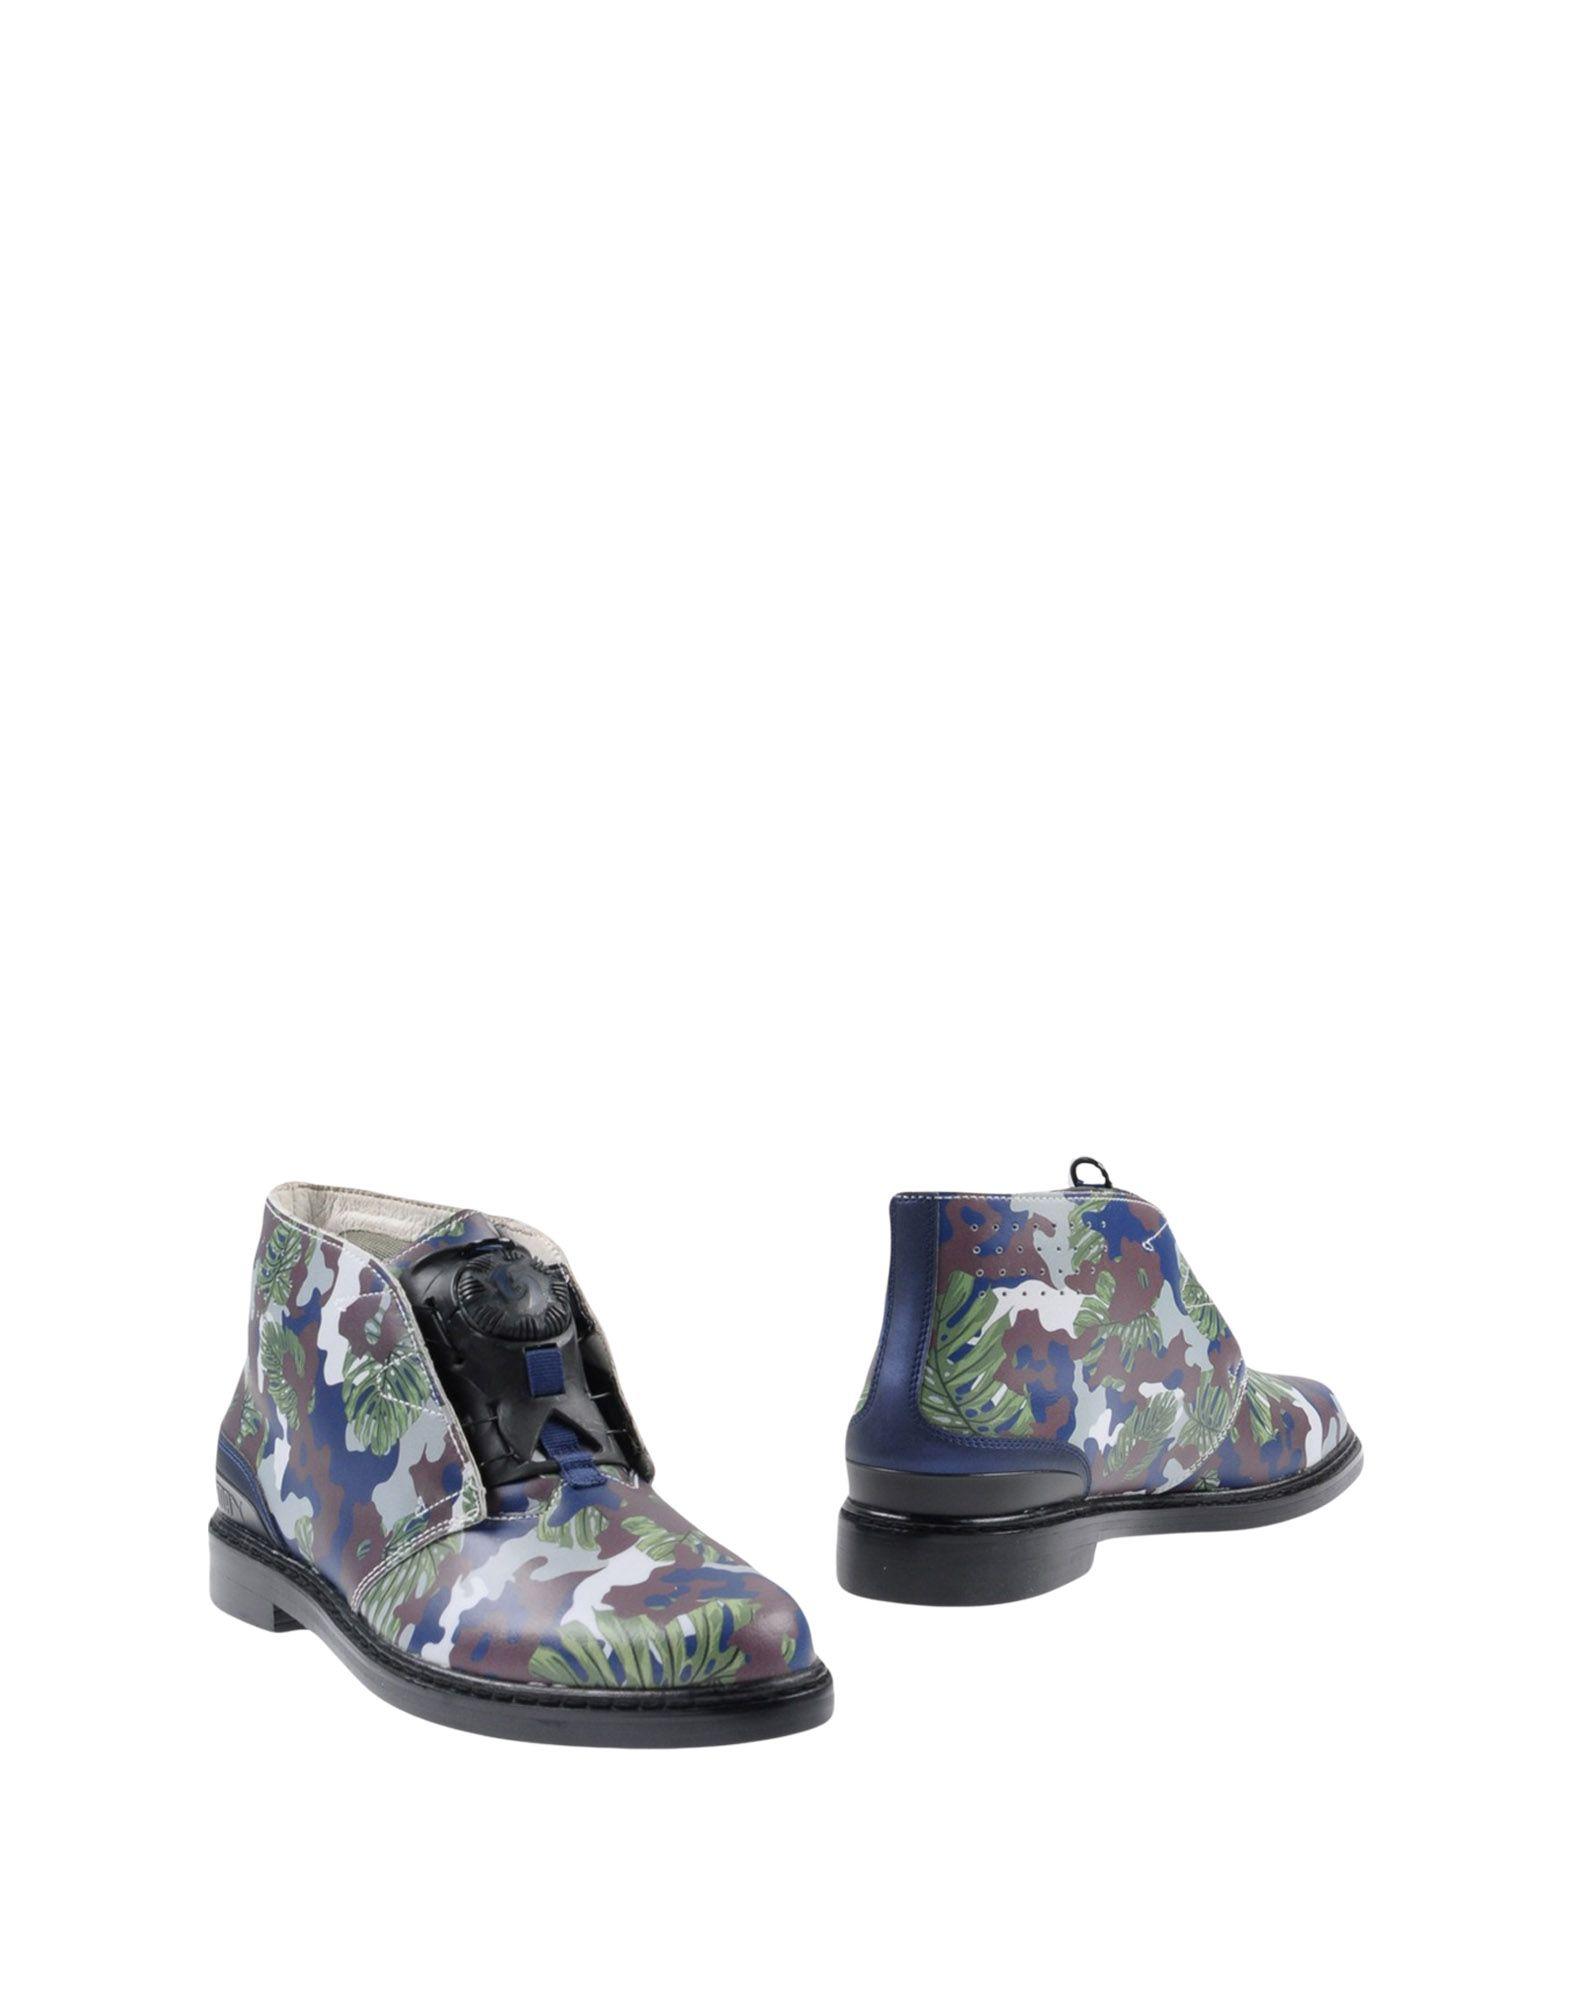 PUMA by MIHARAYASUHIRO Полусапоги и высокие ботинки rihanna x puma полусапоги и высокие ботинки